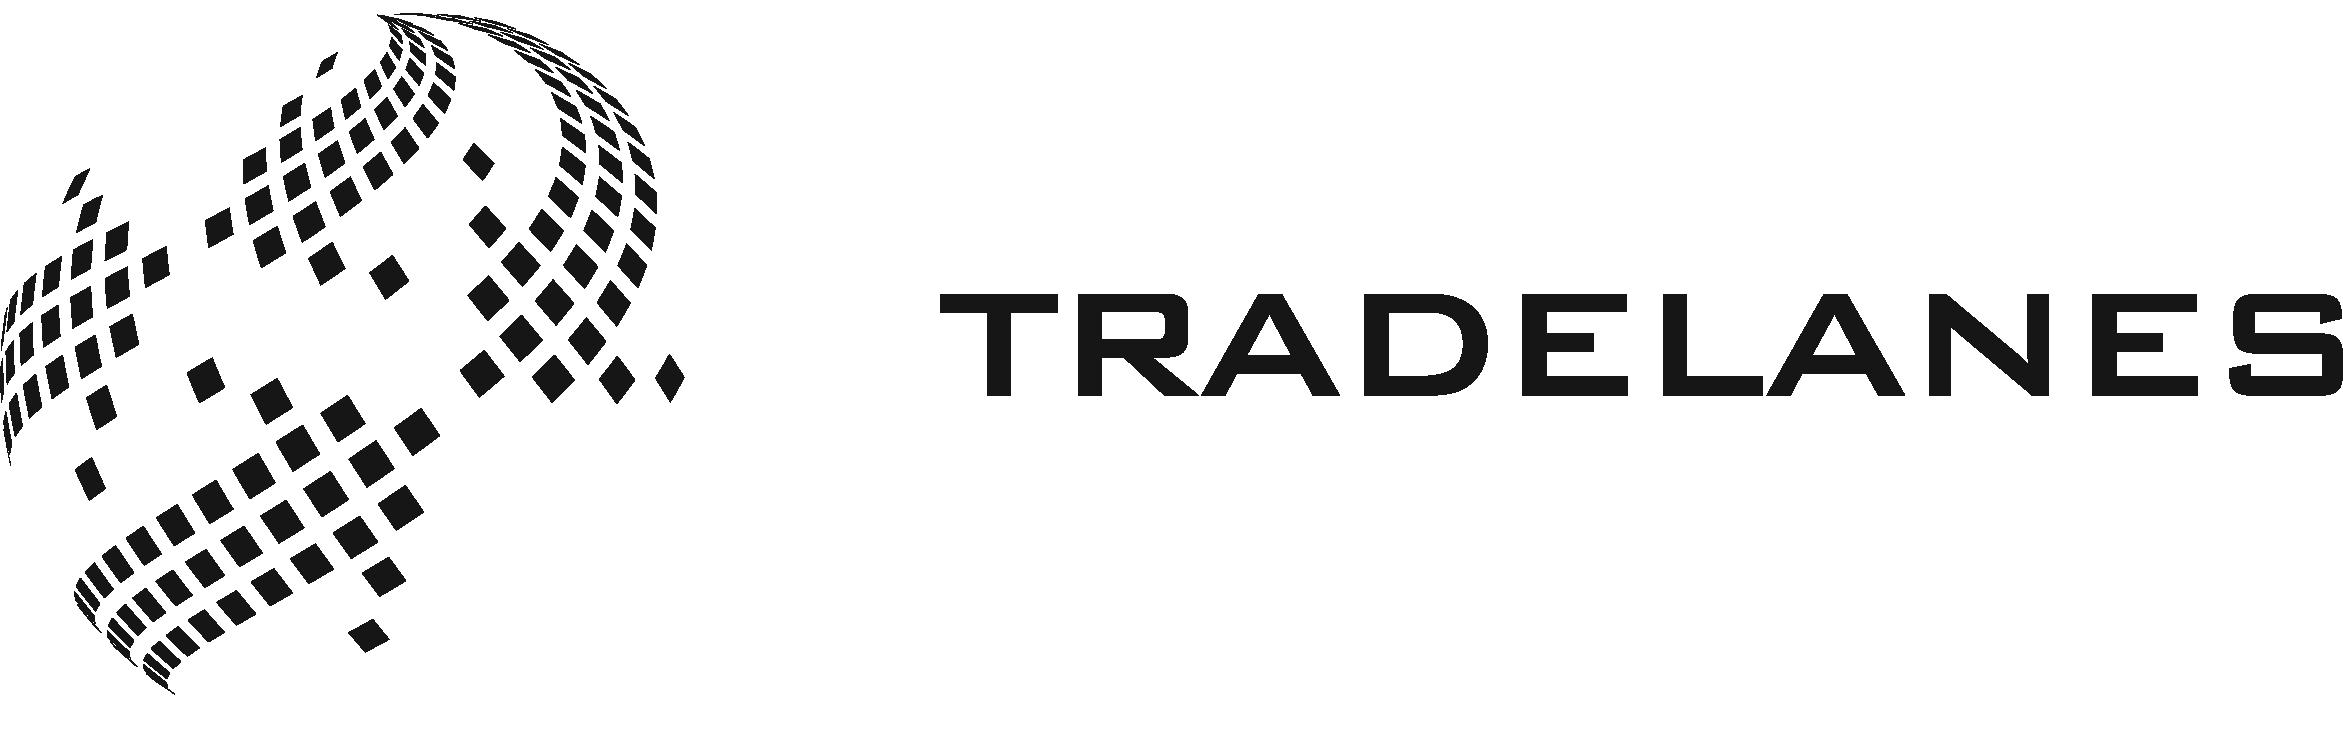 TradeLanes-Final-white